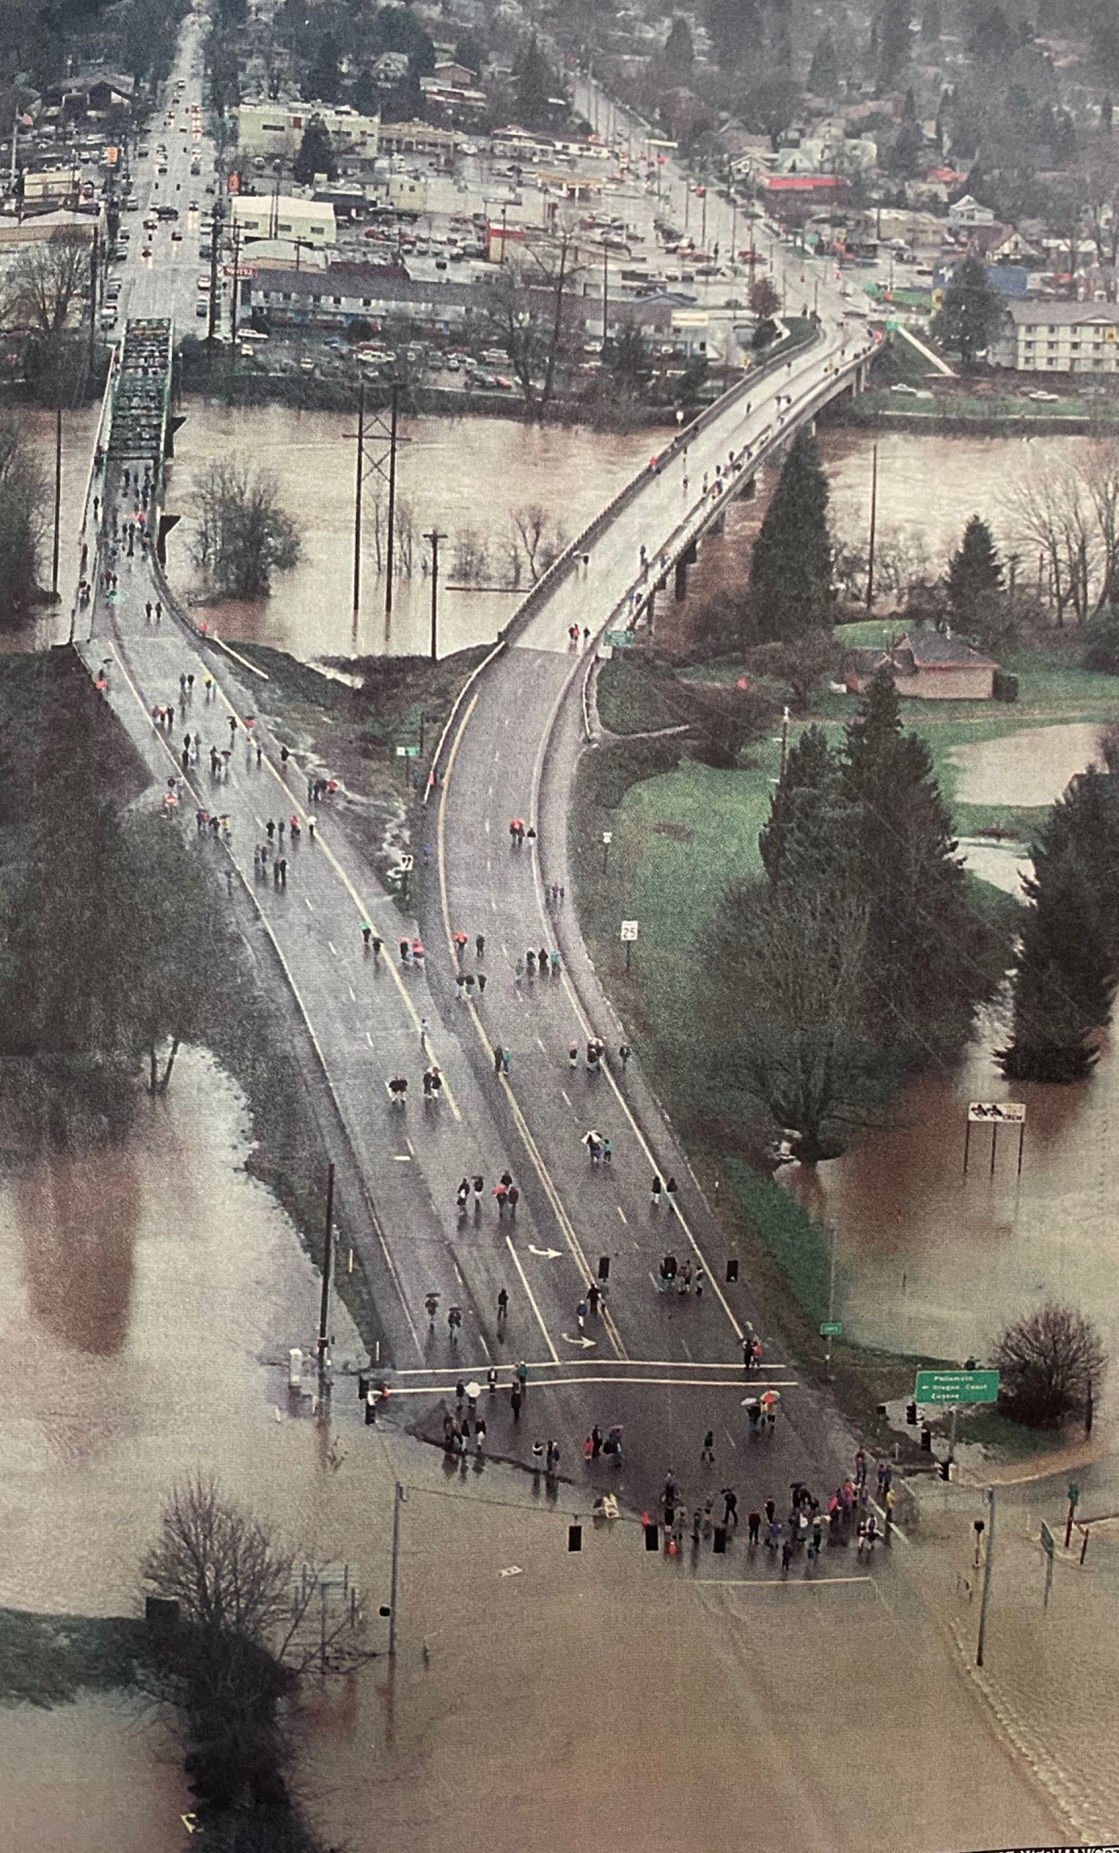 020721-adh-nws-flood Photo Page2